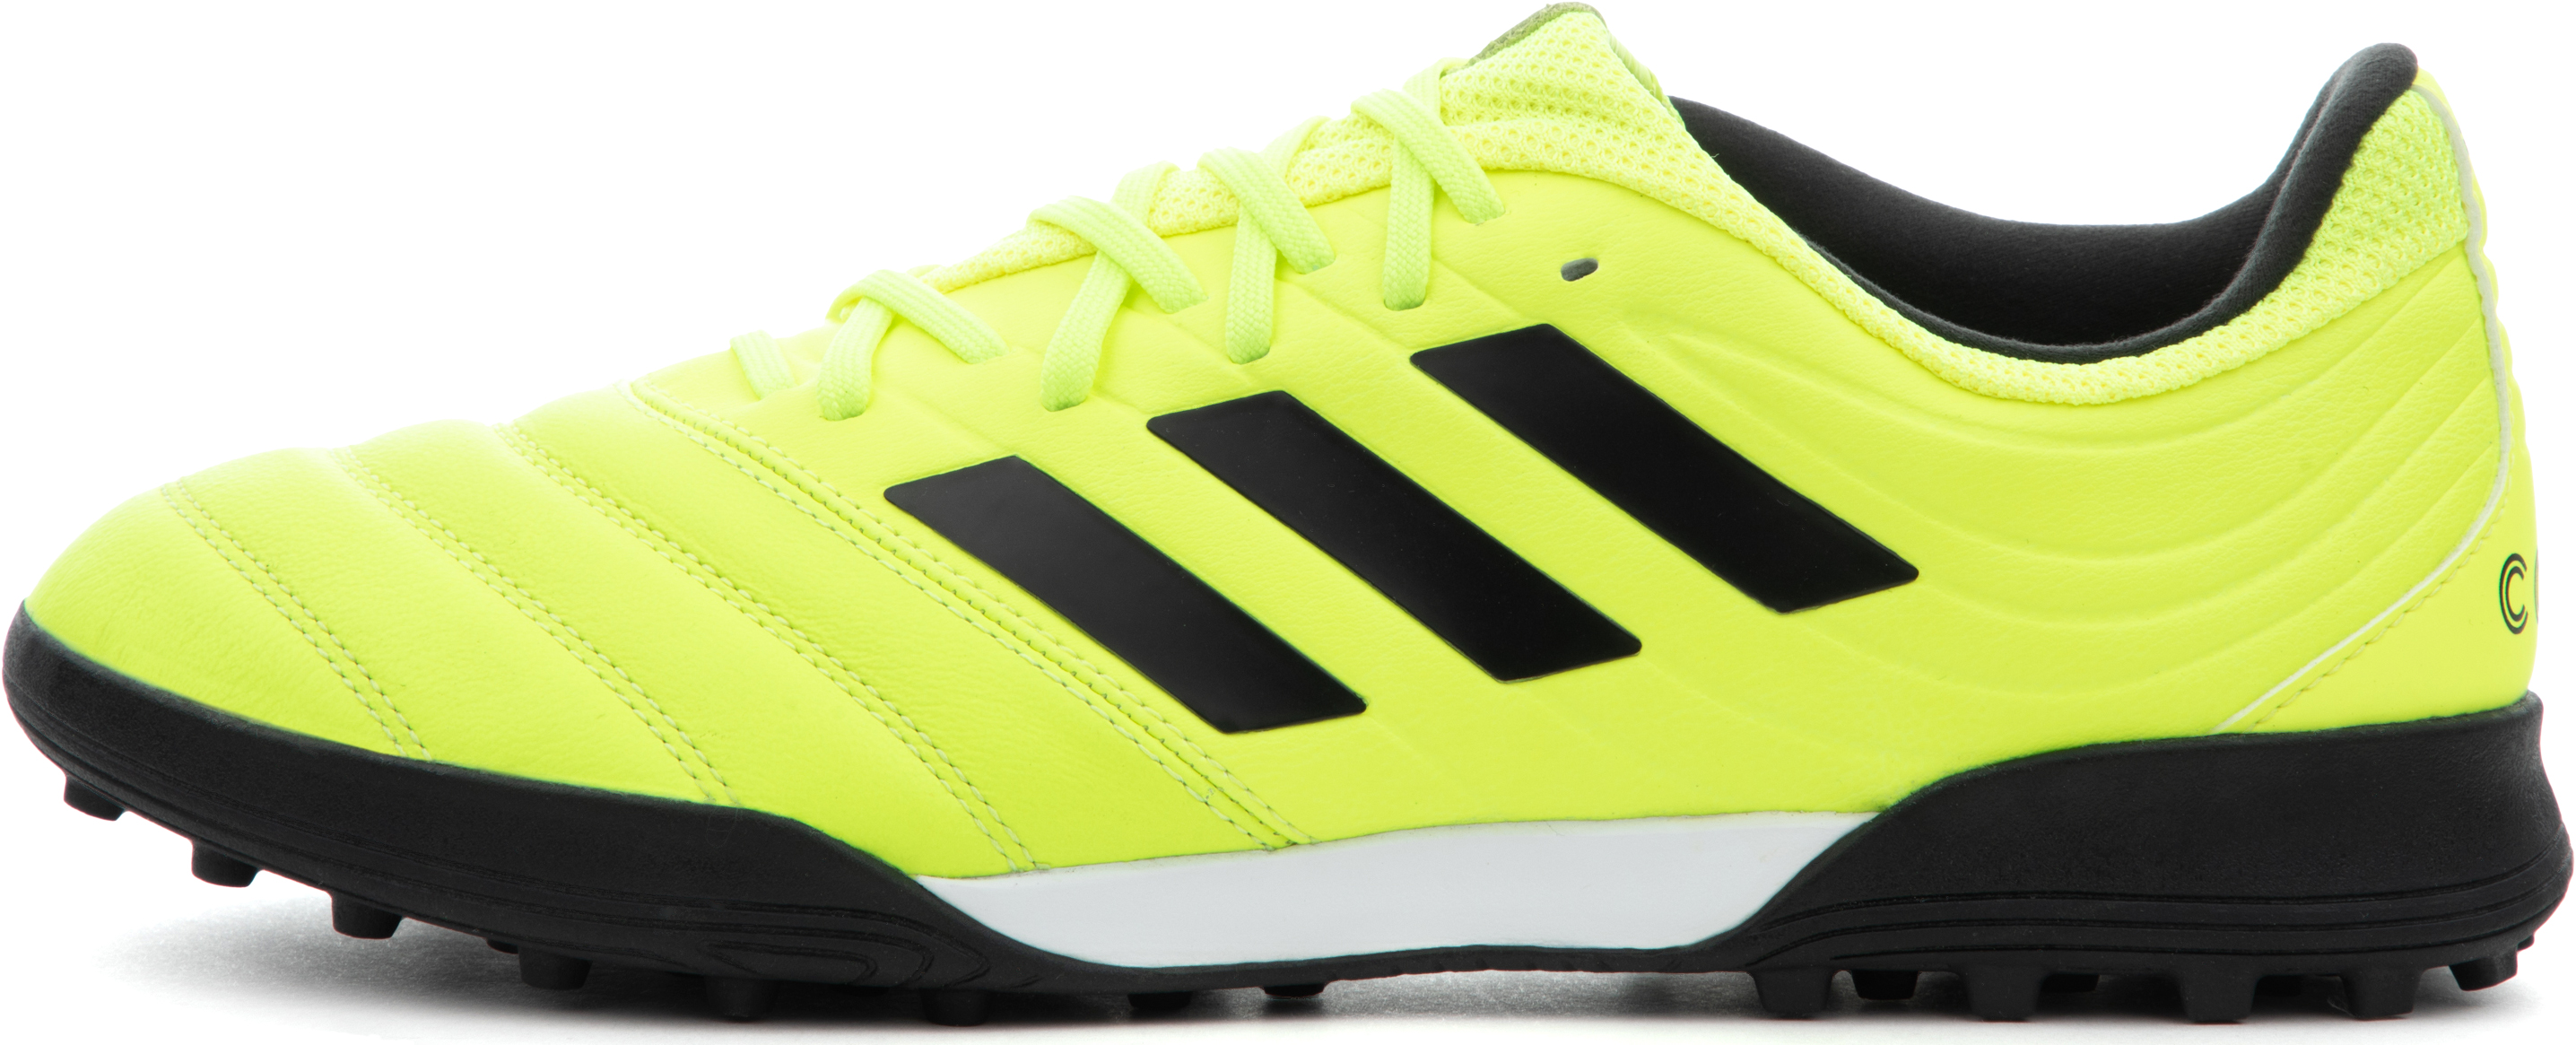 Adidas Бутсы мужские Adidas Copa 19.3 TF, размер 44,5